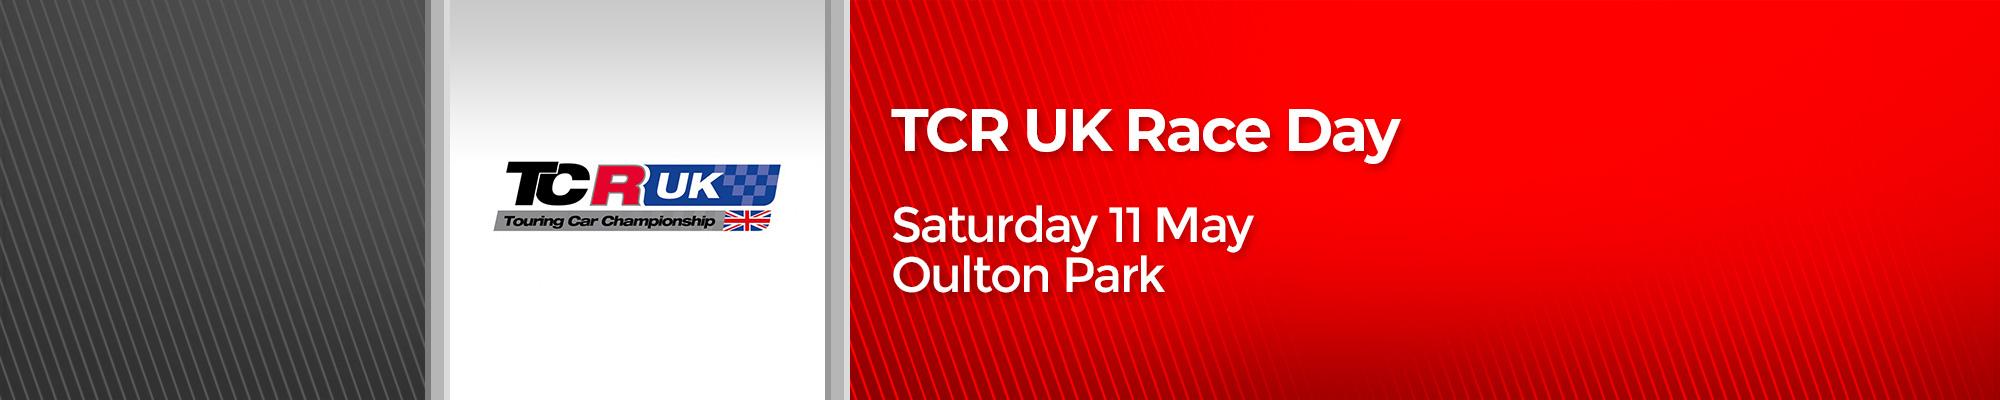 TCR UK Race Day